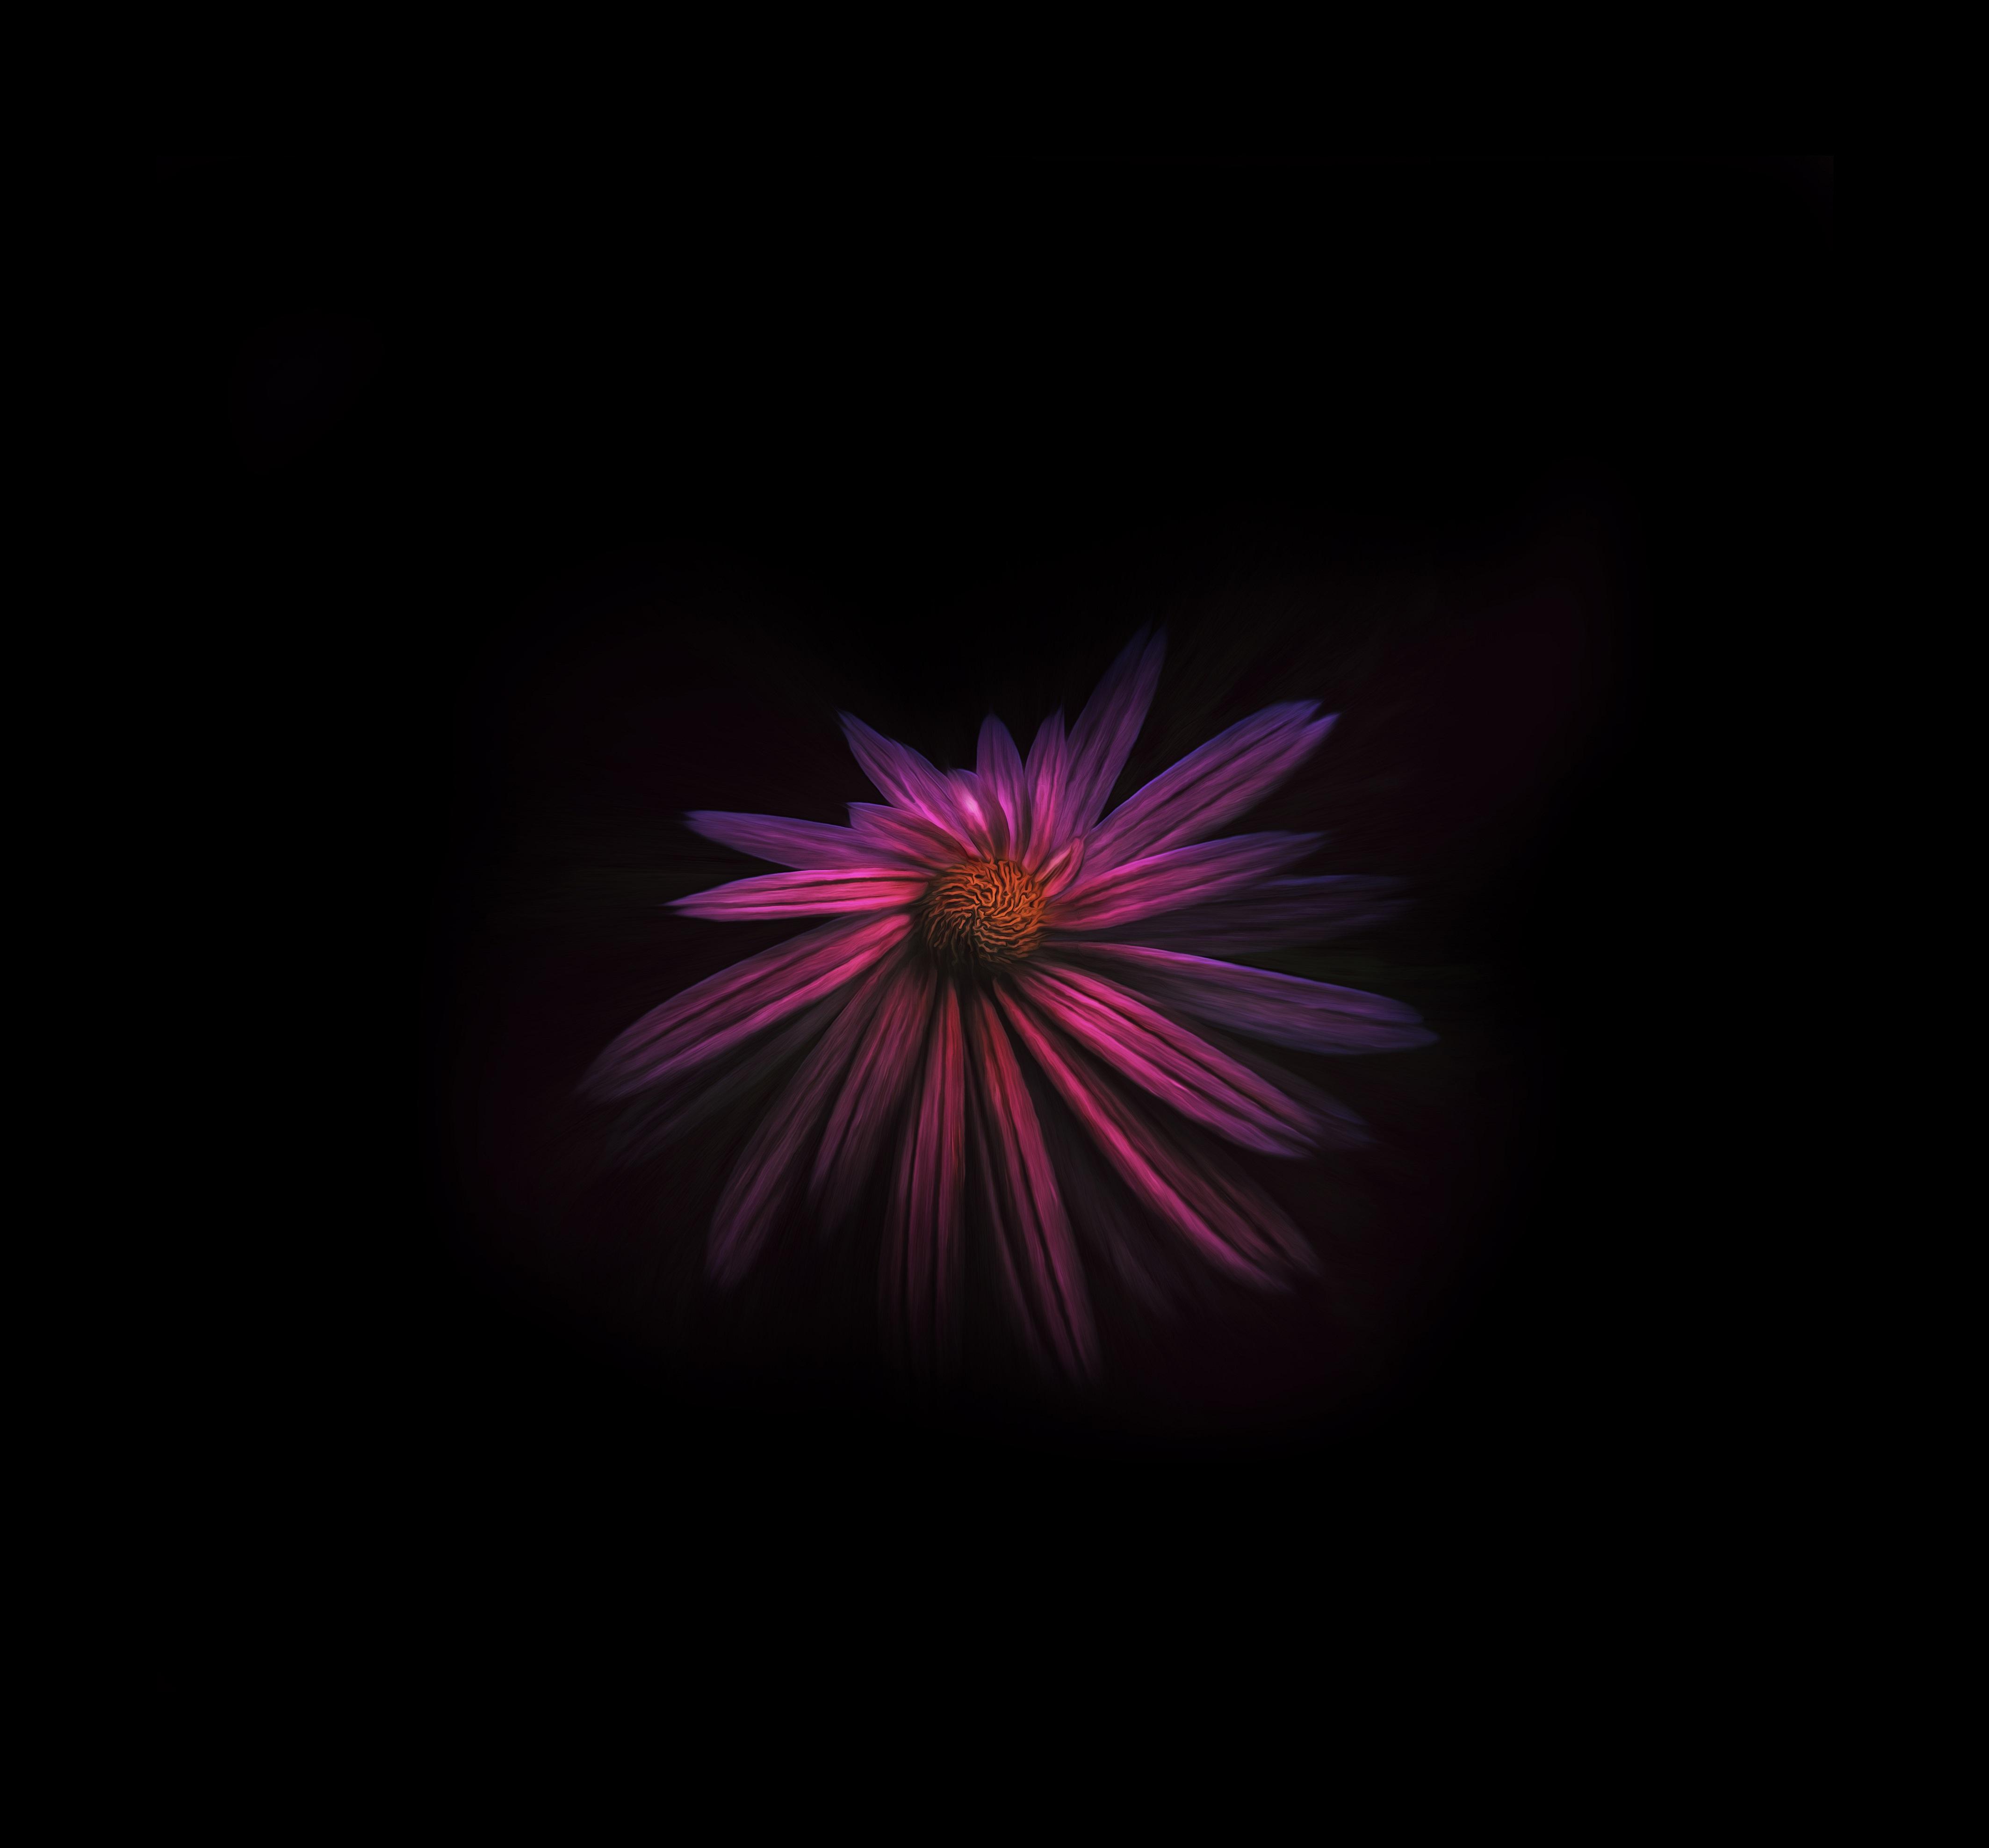 Flower Dark Background 4k, HD Flowers, 4k Wallpapers